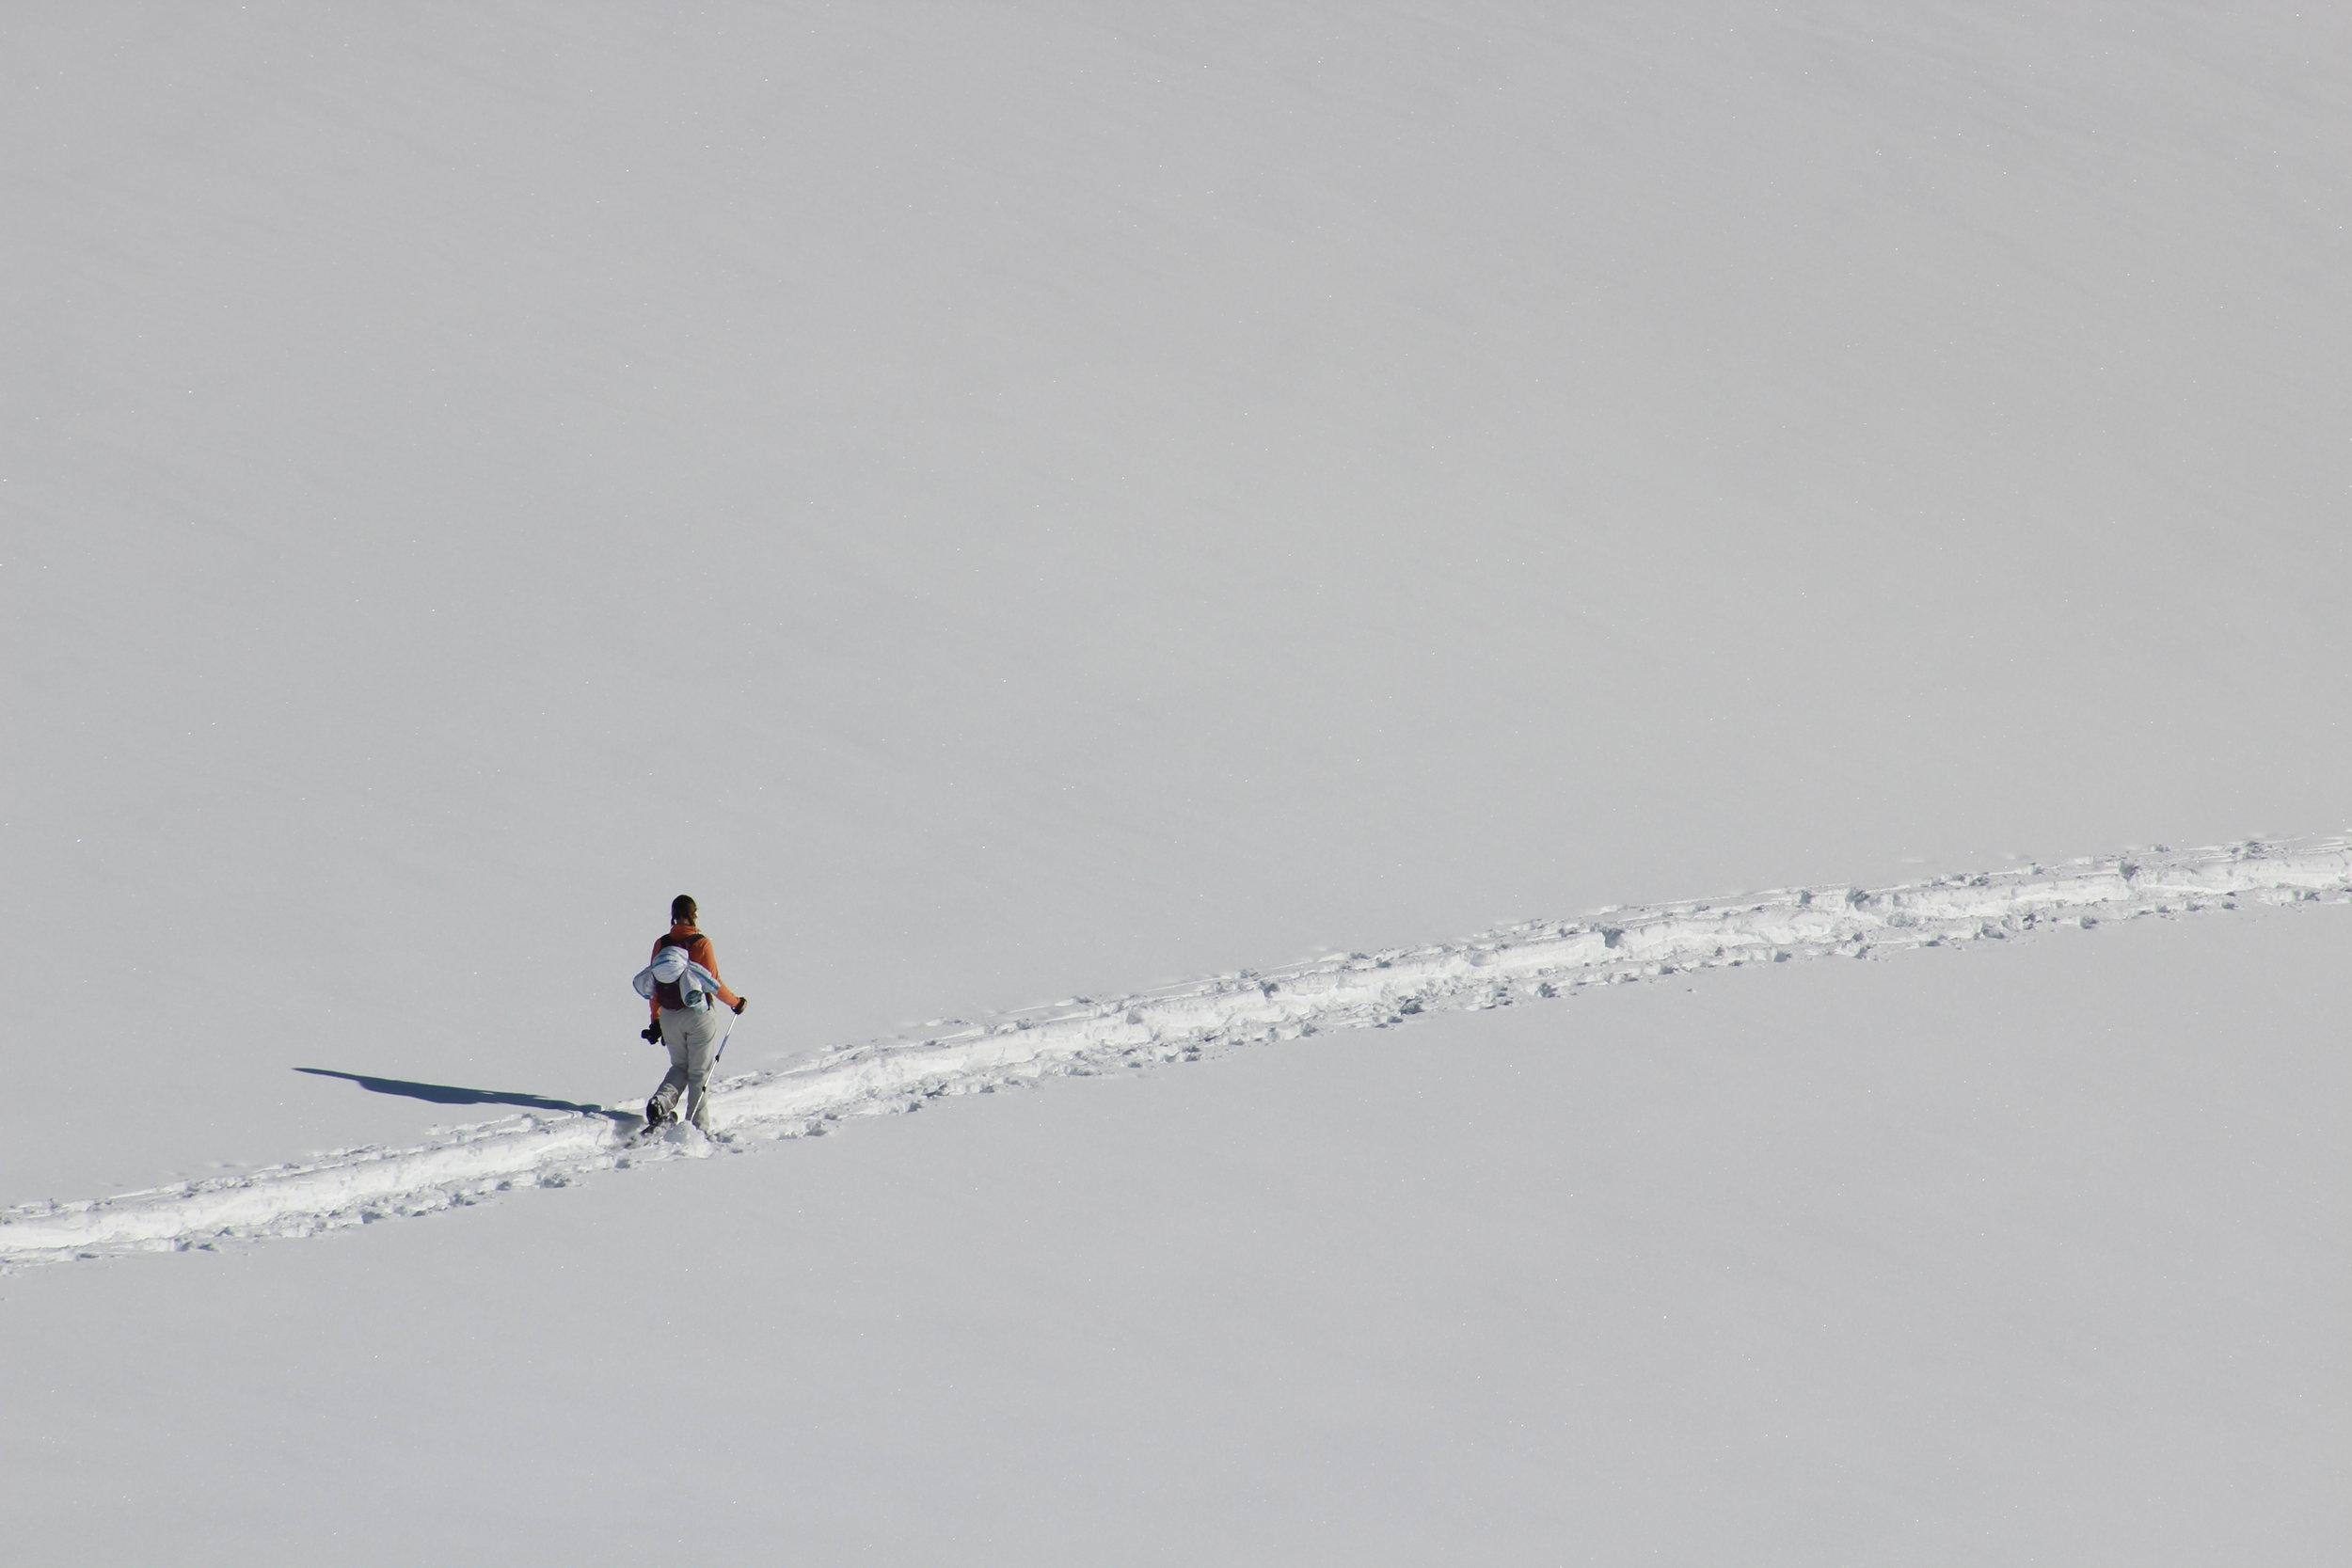 Tory crosses a snow field